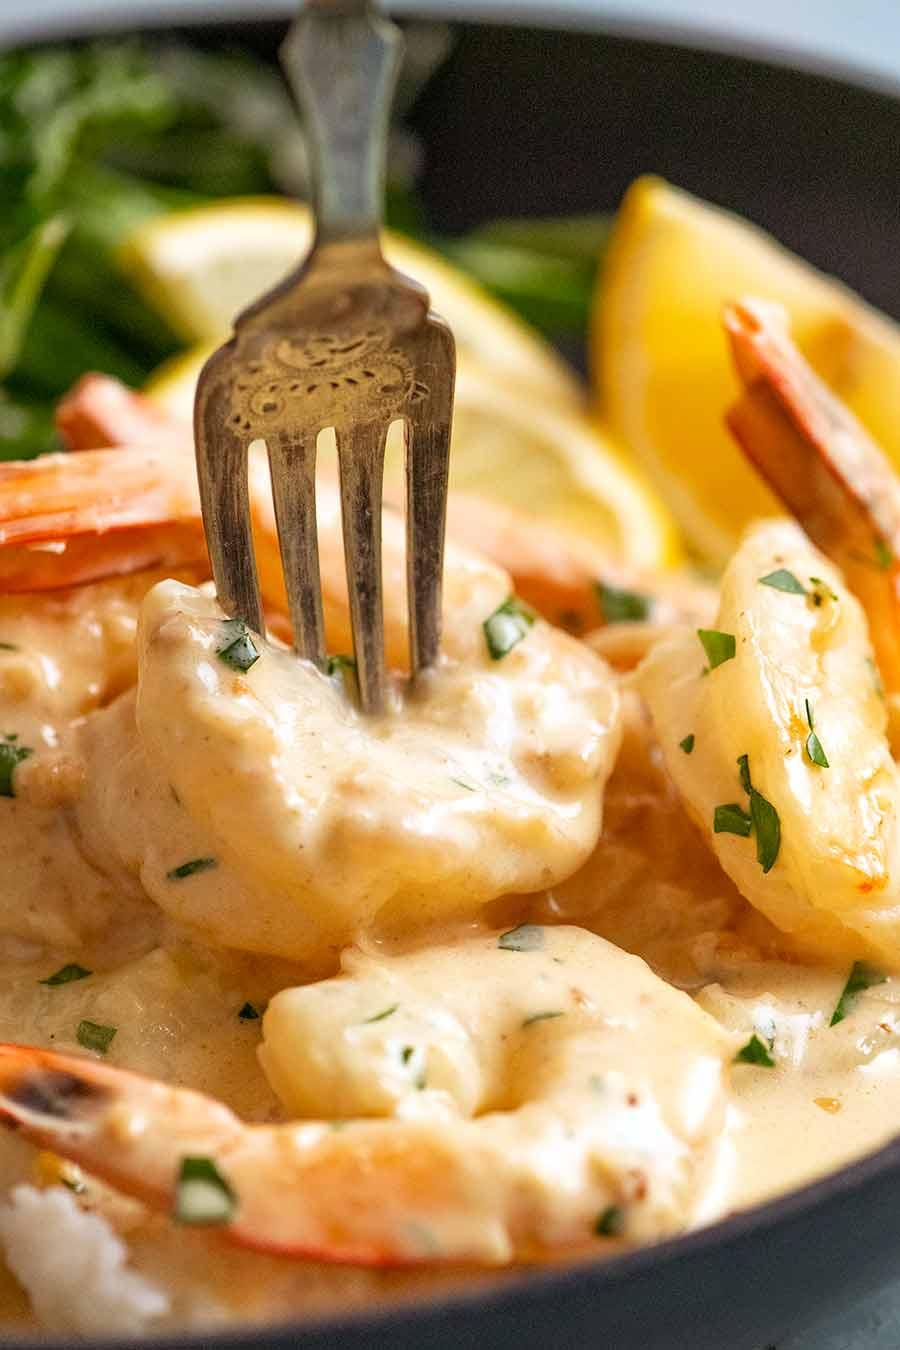 Fork picking up a Creamy Garlic Prawns (Shrimp)